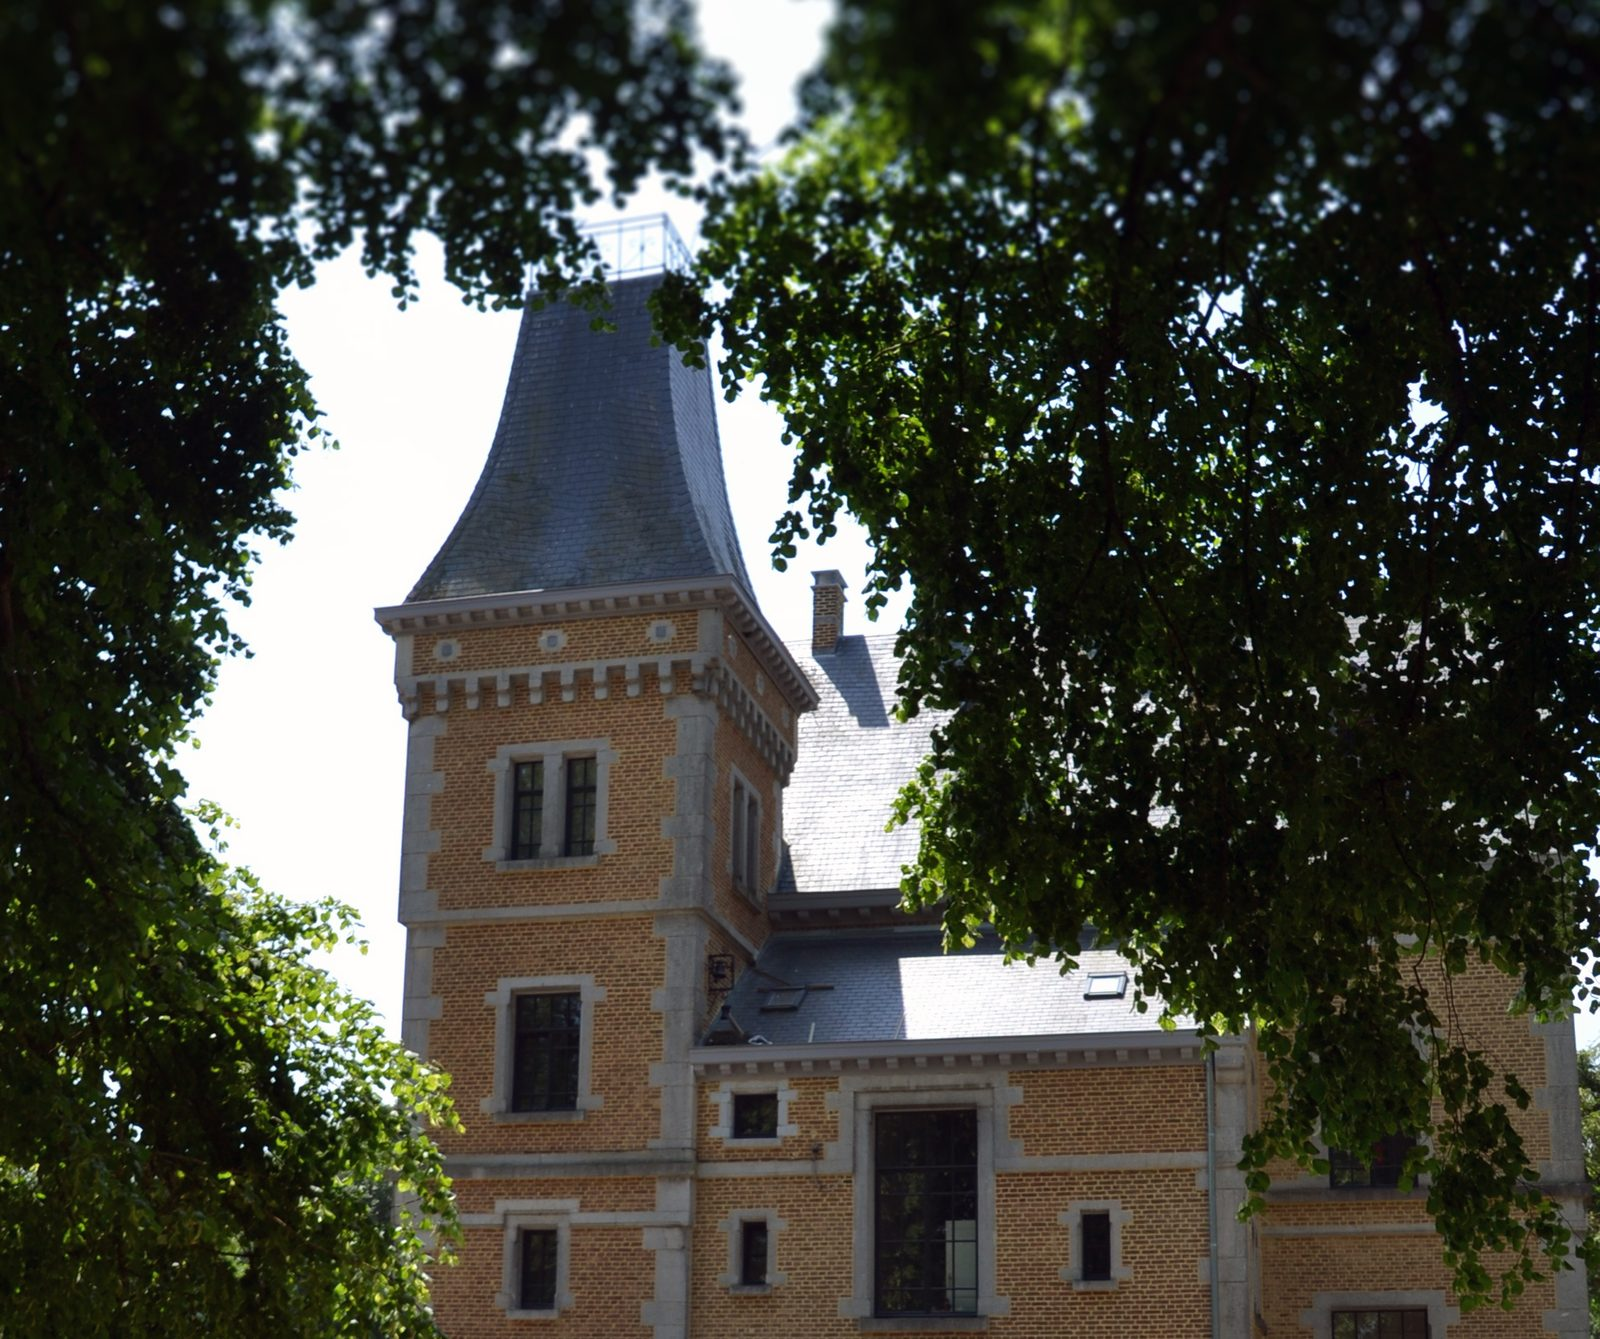 Séjourner au Château Beausaint